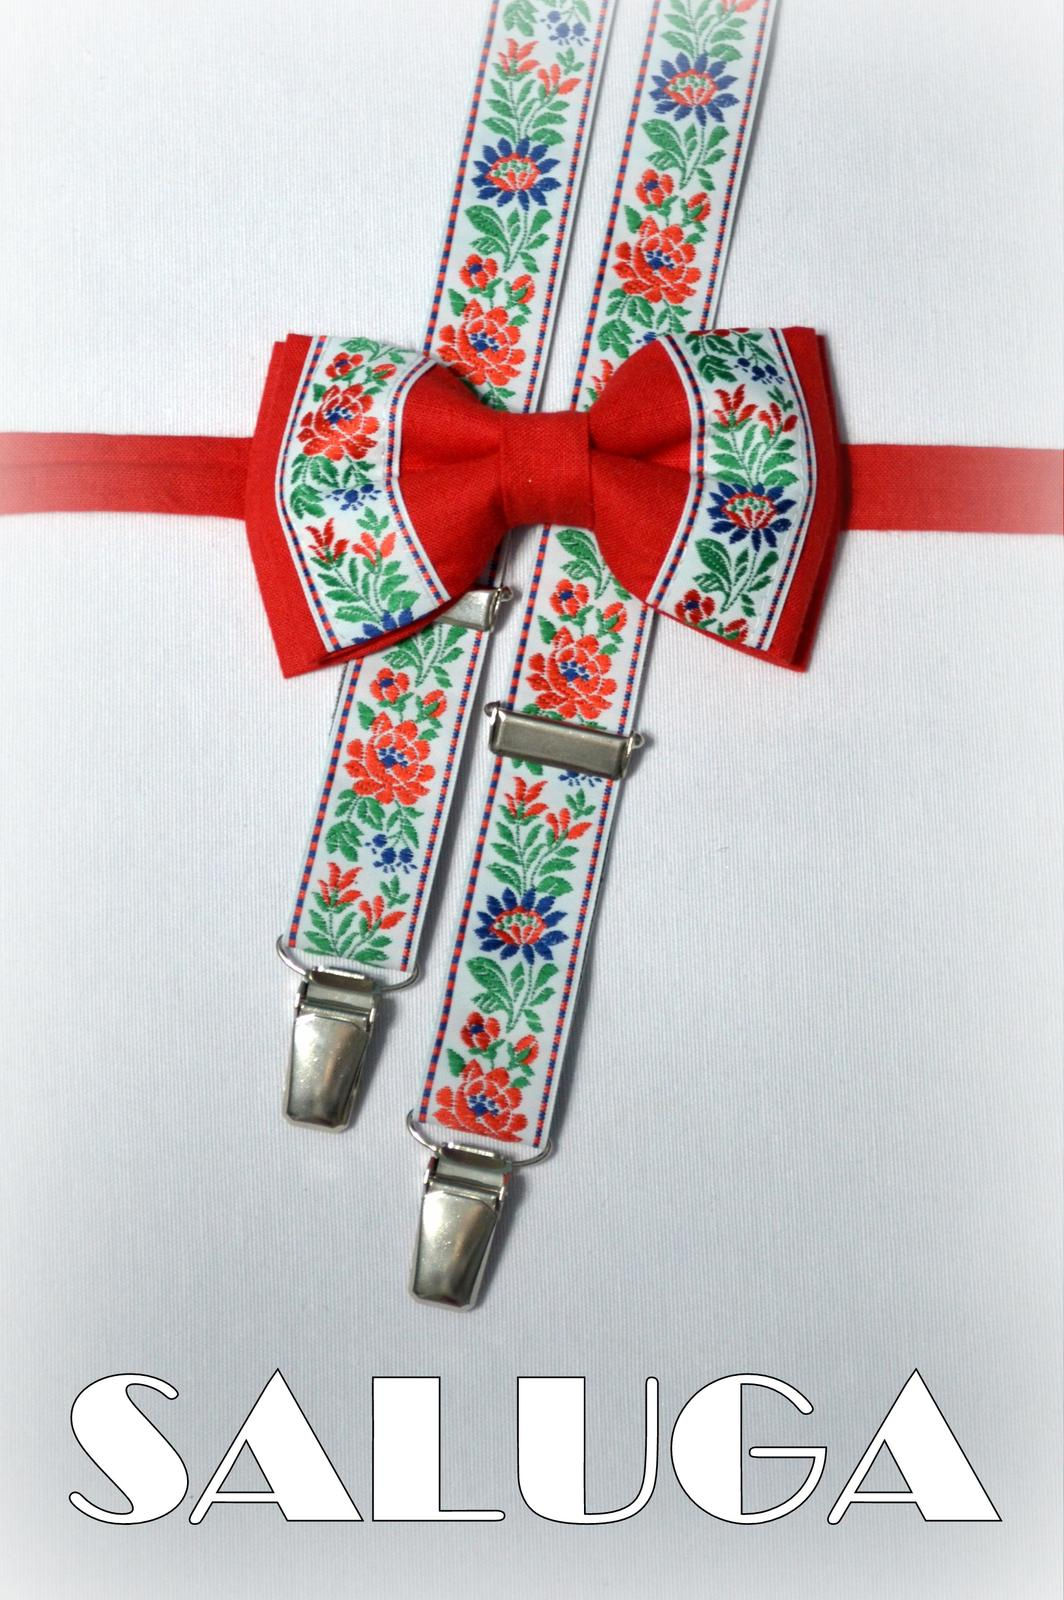 Folklórny pánsky červený motýlik - folkový ľudový  - Obrázok č. 1